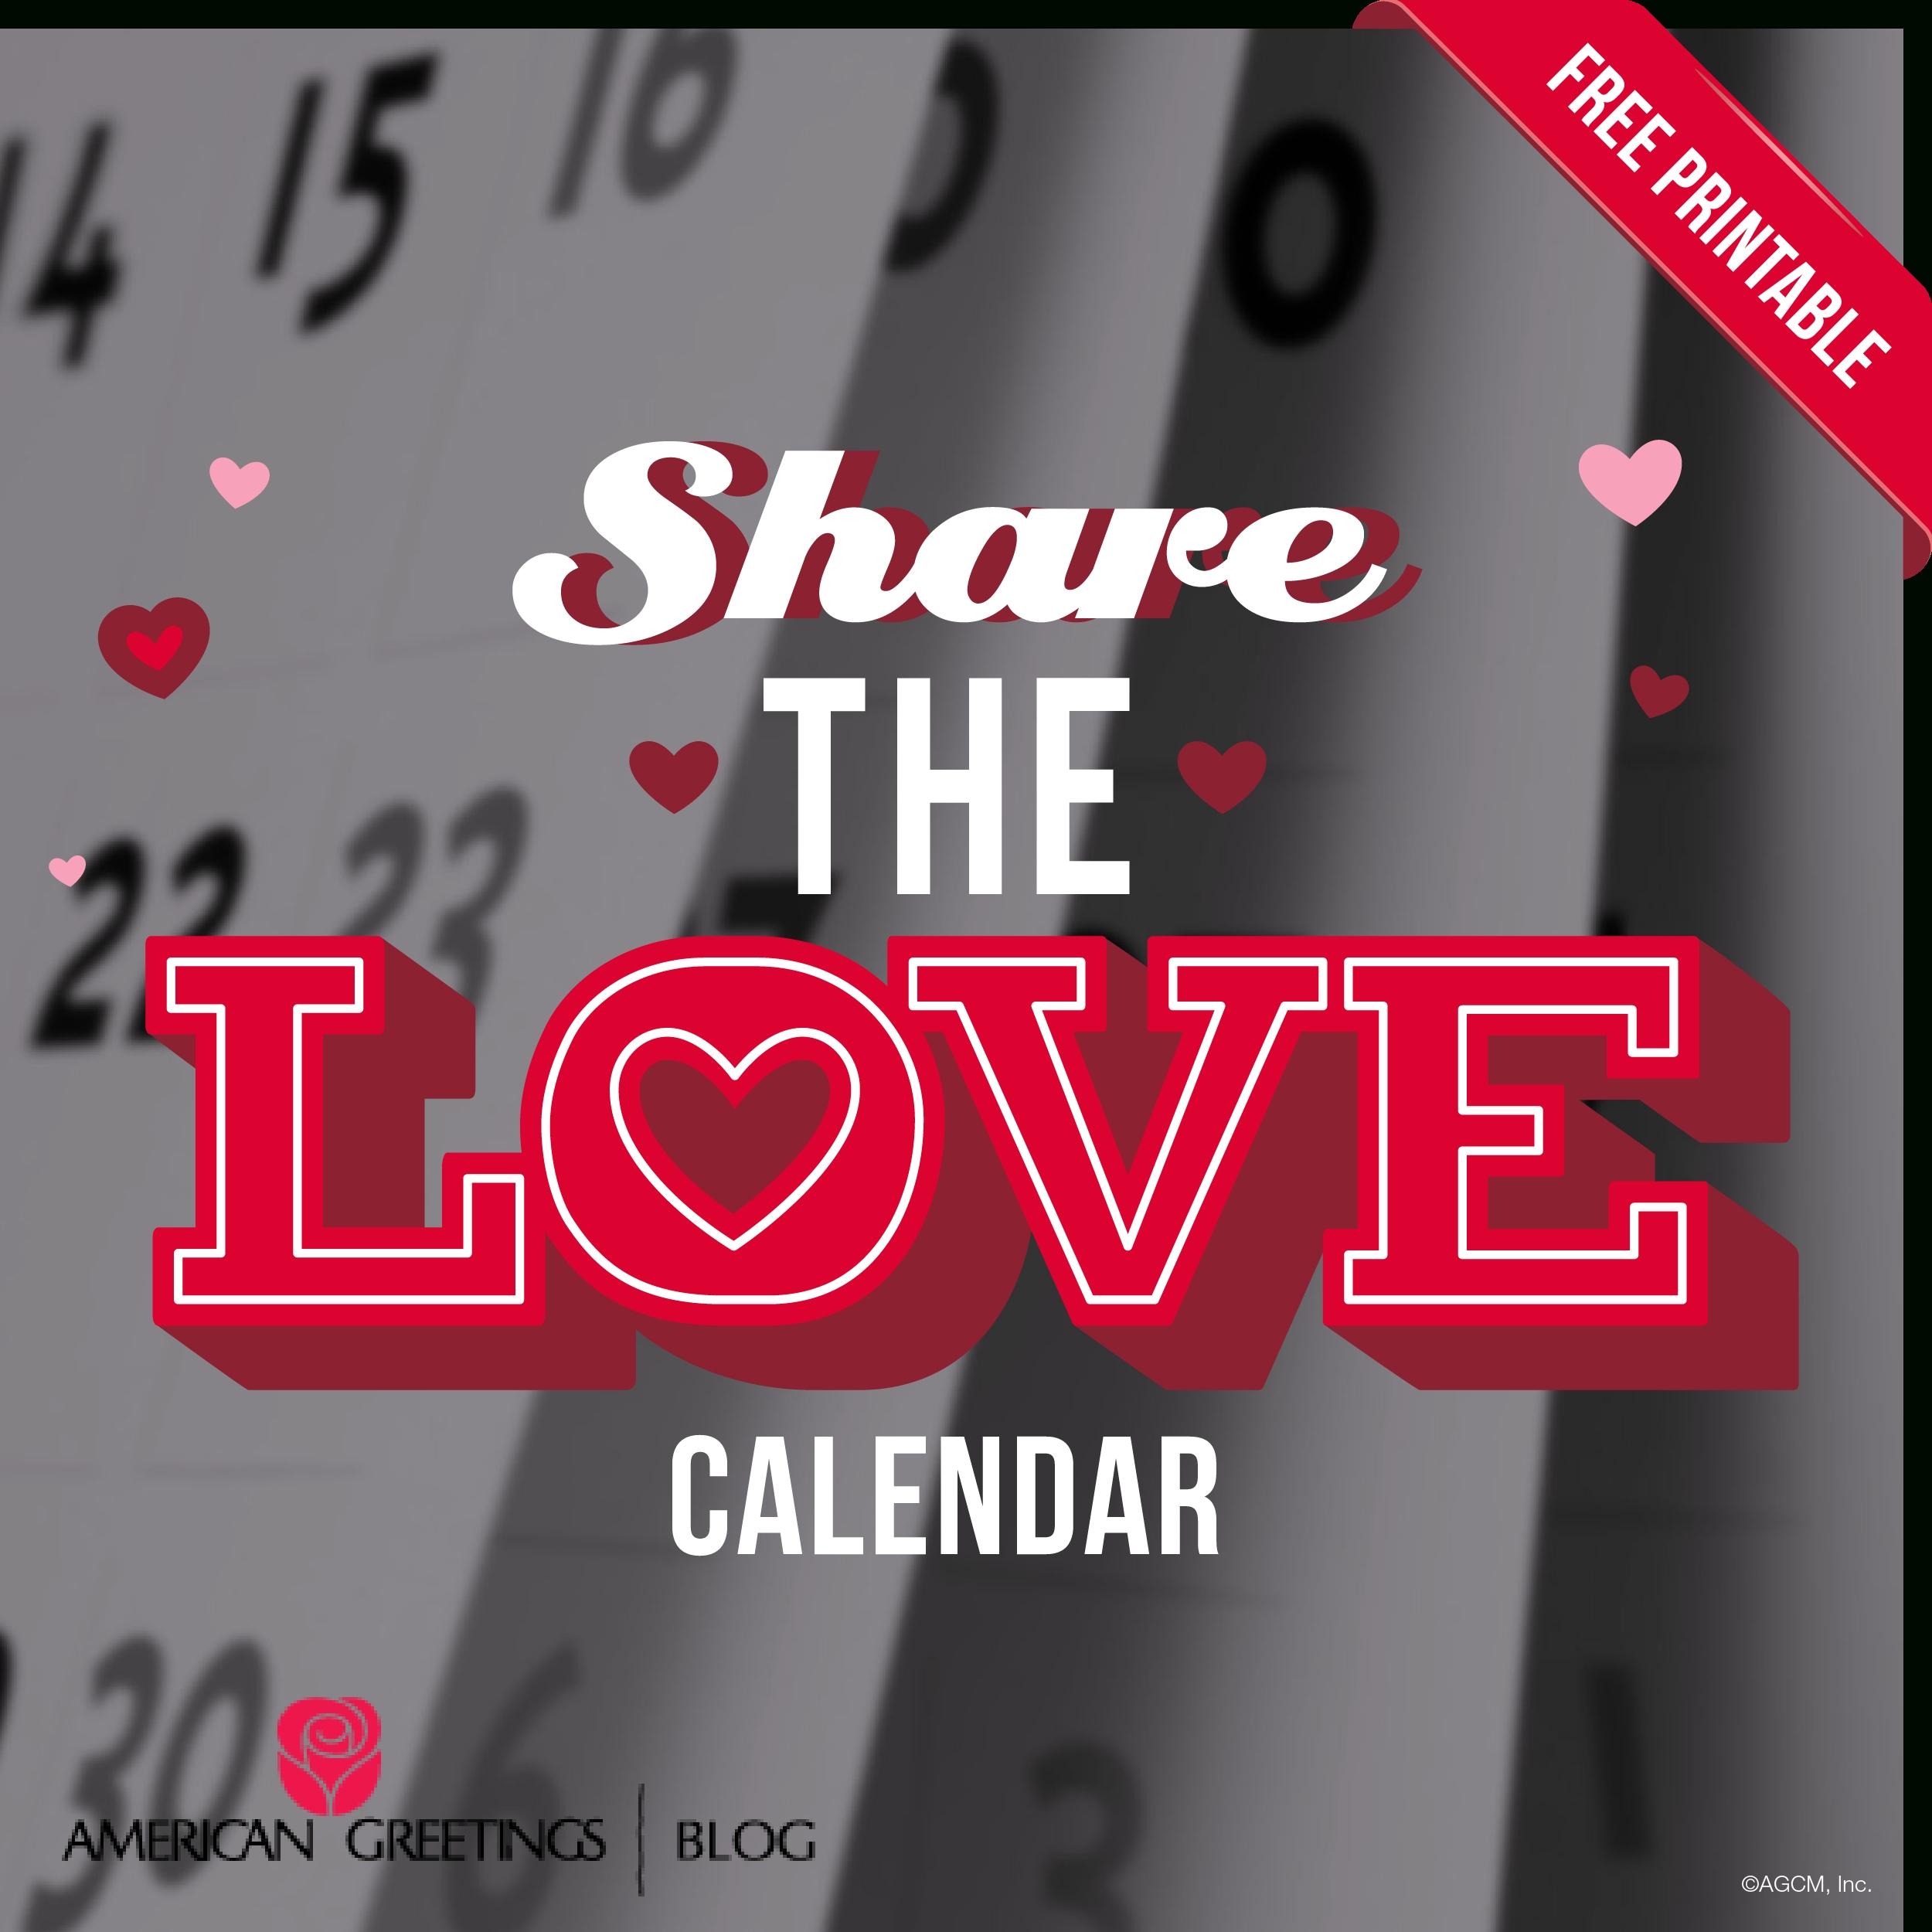 Printable Valentine's Day Calendar| American Greetings